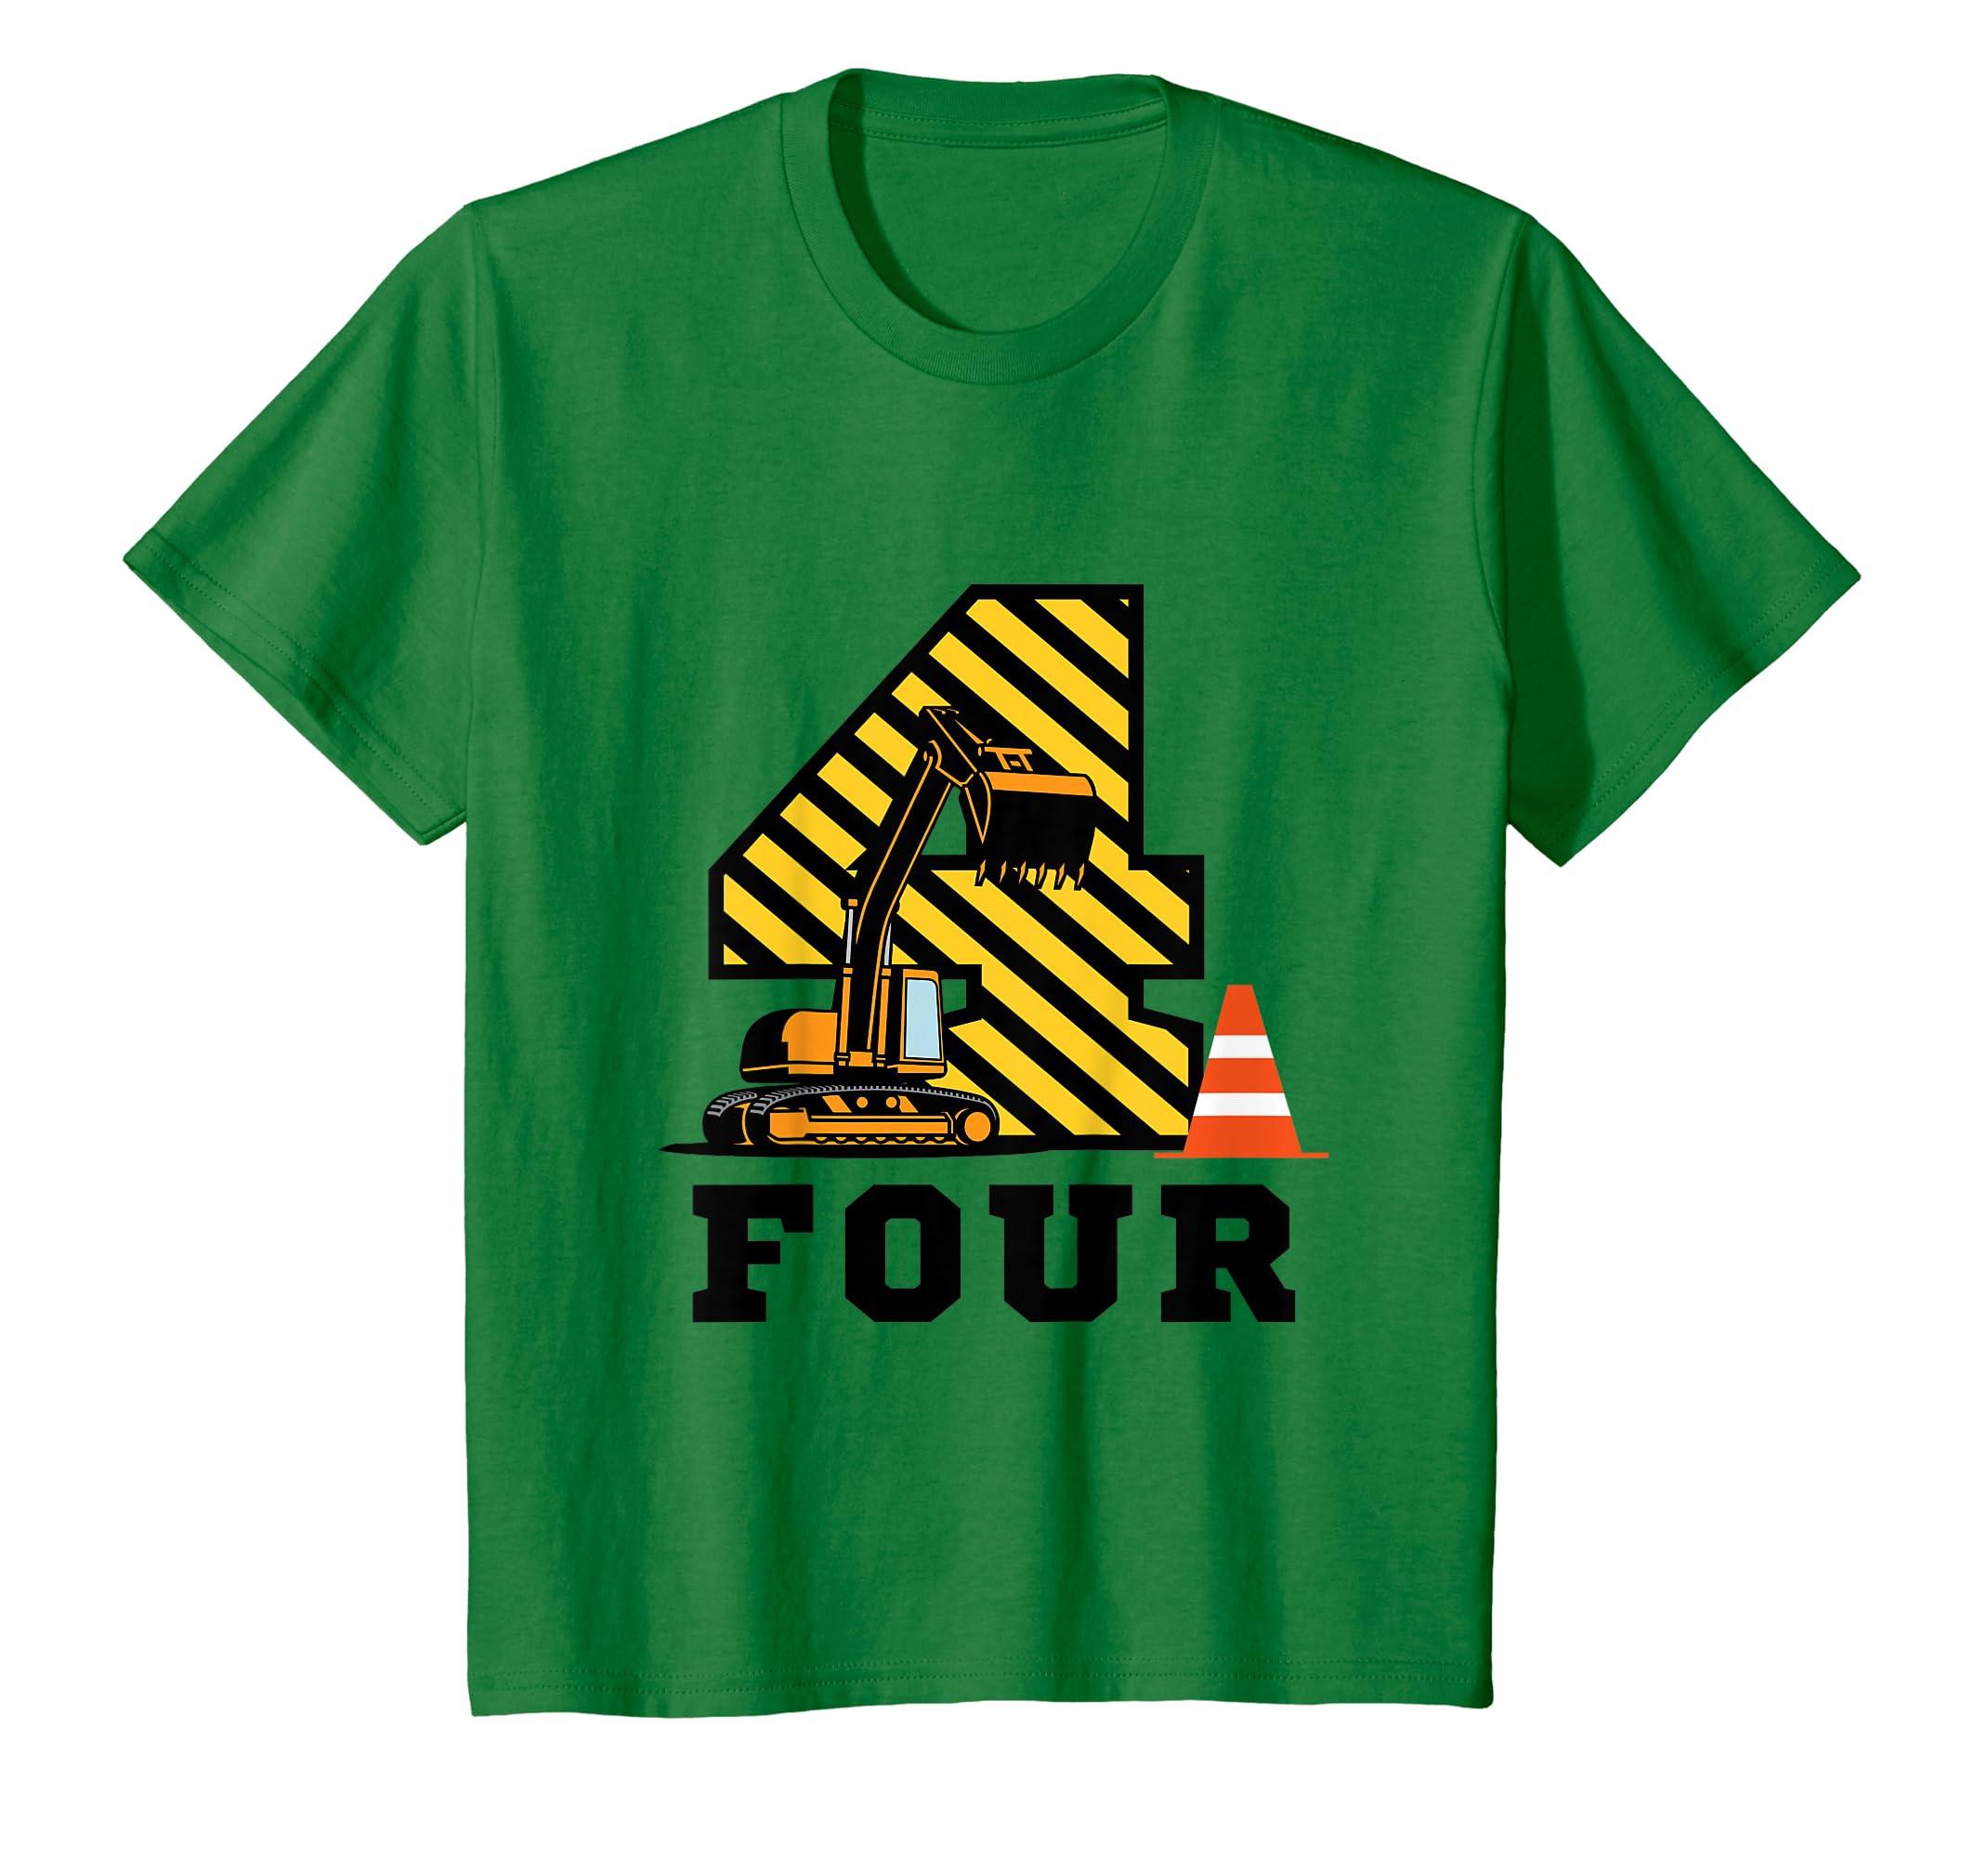 Amazon Kids Construction Birthday Boy Shirt 4 Years Old Clothing